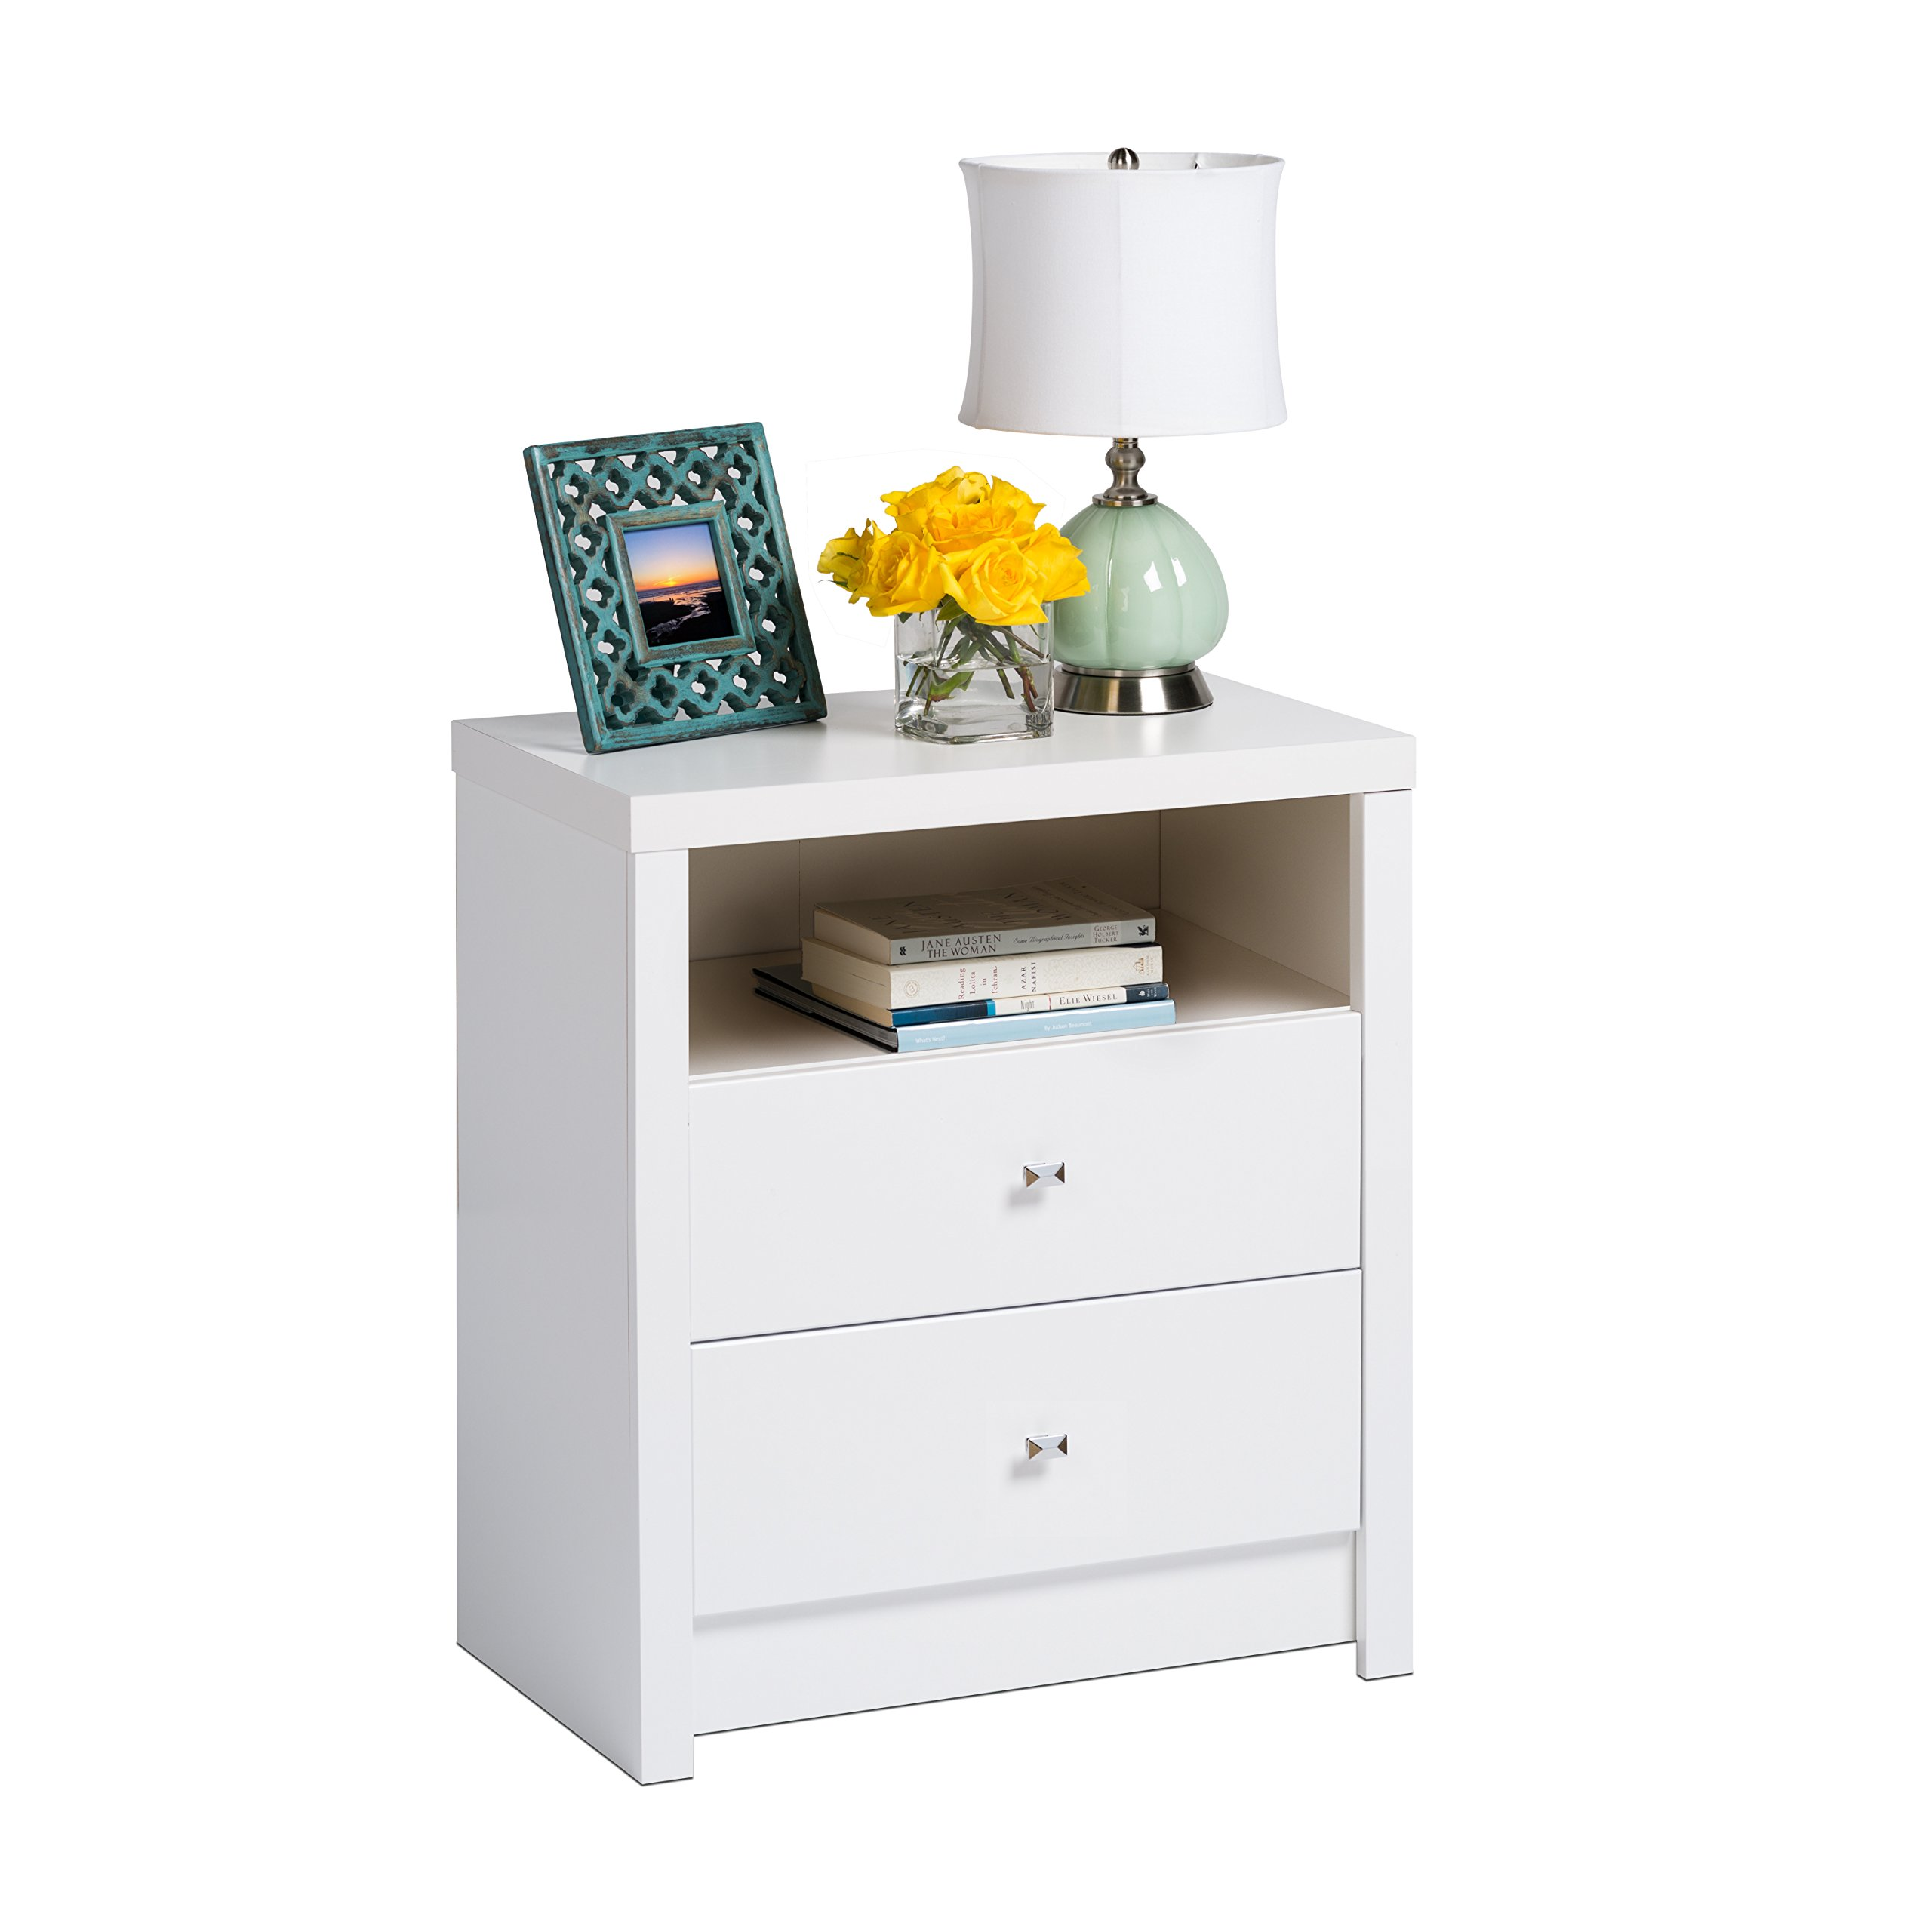 Prepac Calla Tall 2 Drawer Nightstand, White by Prepac